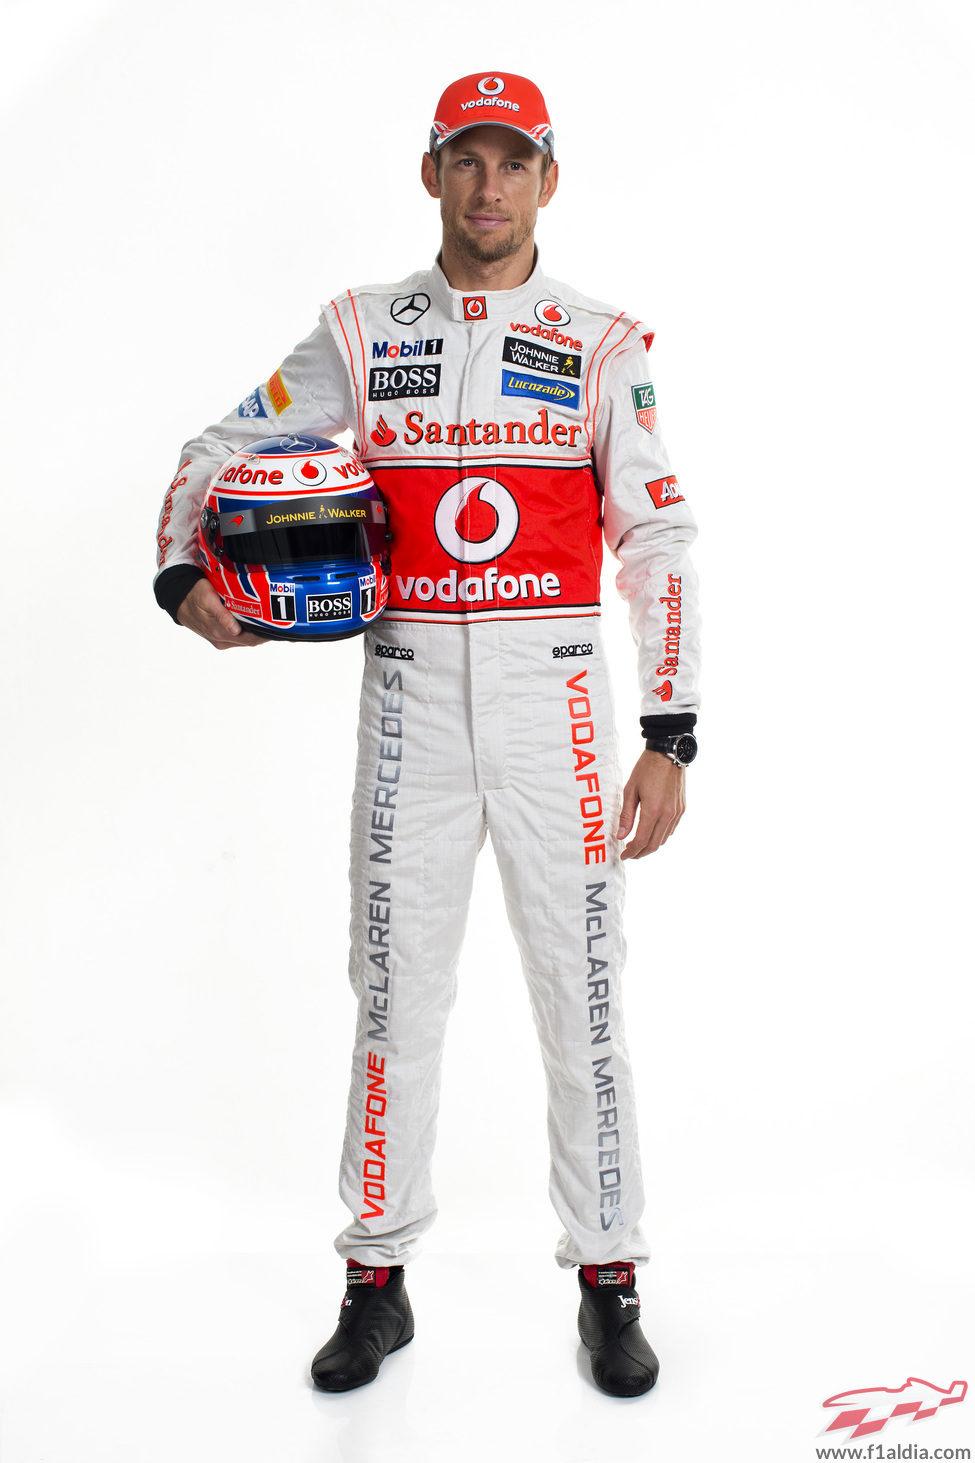 Jenson Button, piloto de McLaren para la temporada 2013